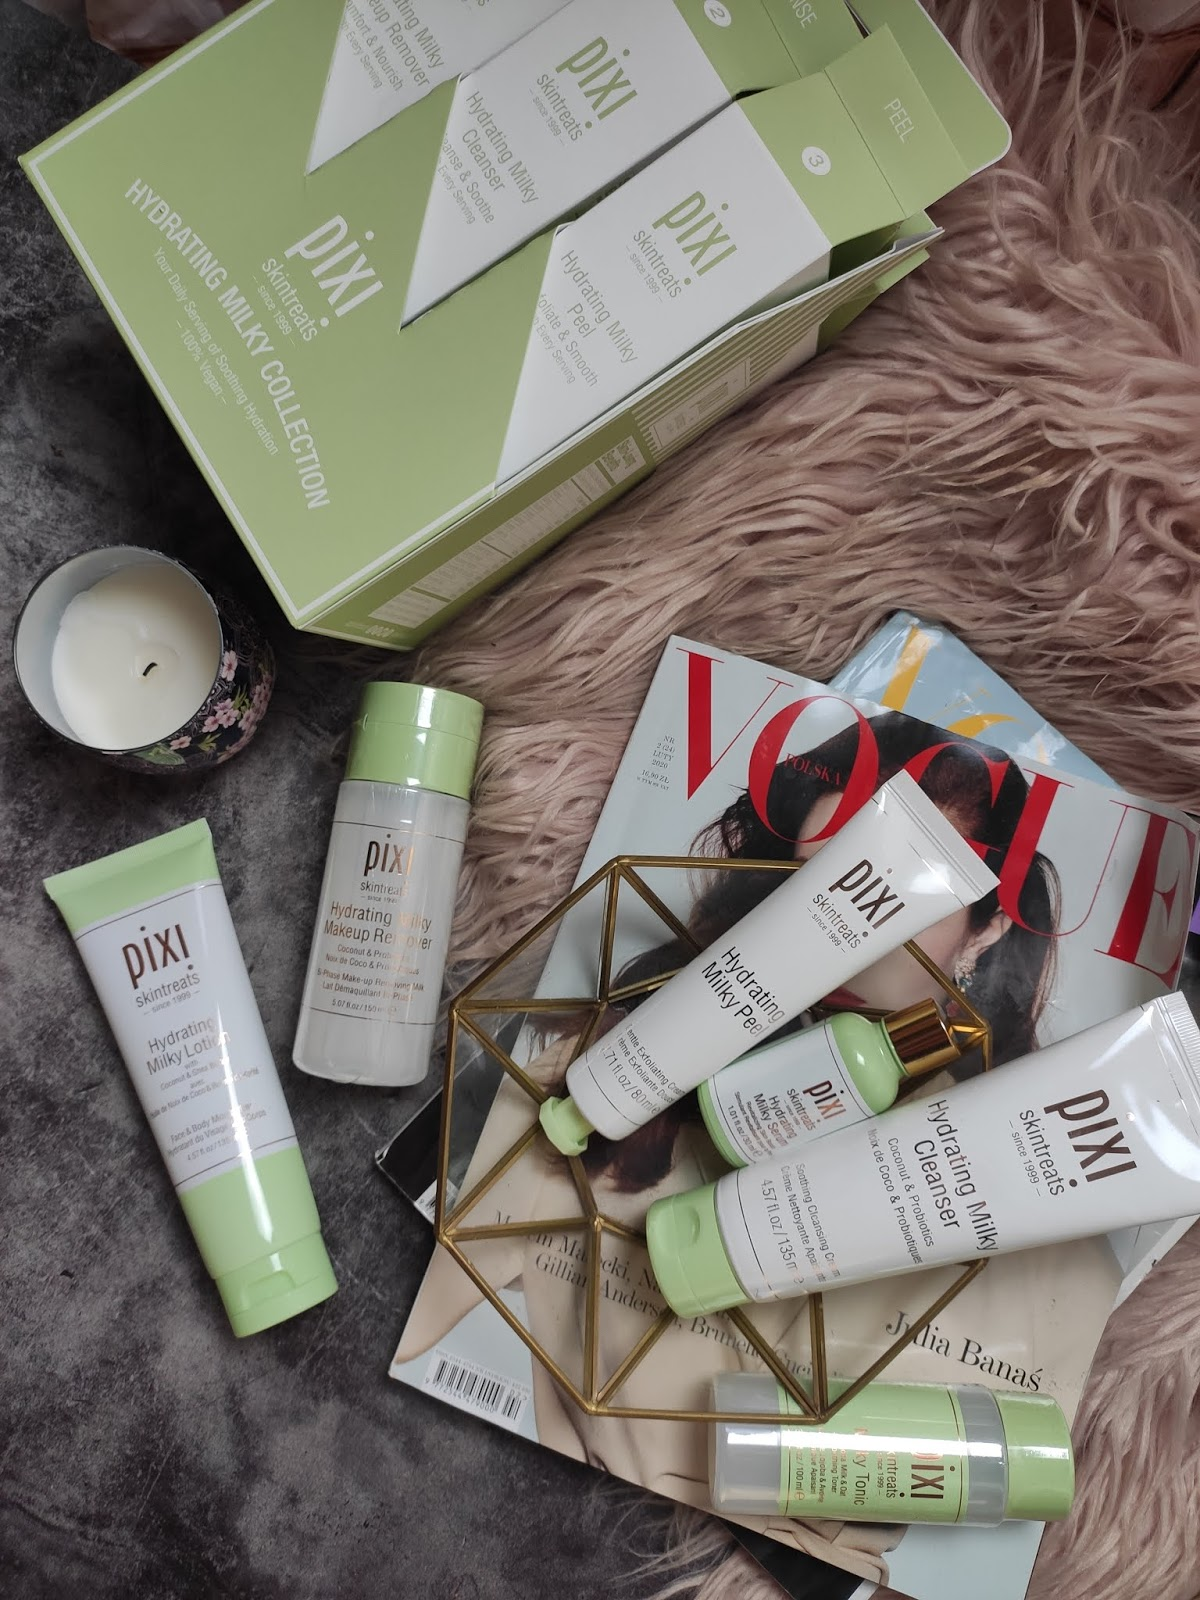 Pixi Beauty Hydrating Milky cosmetics